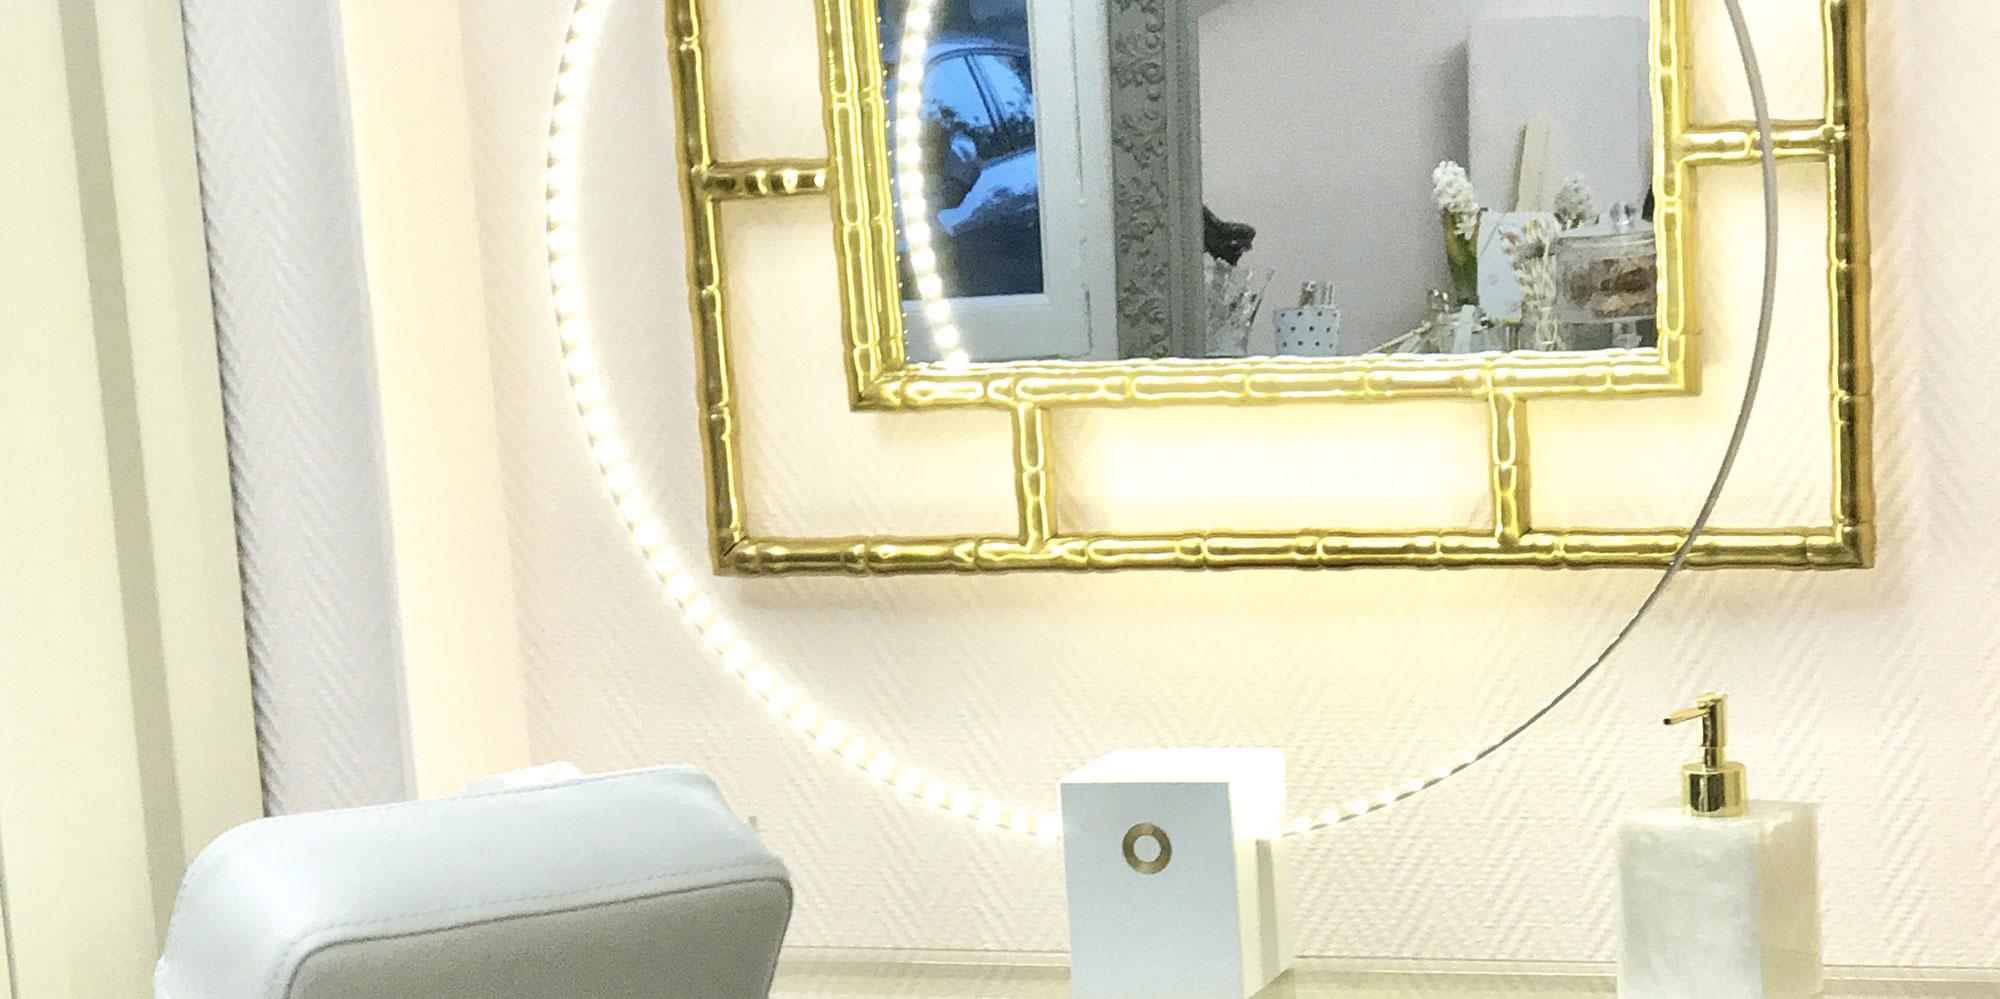 anan-make up studio-blush-brows-brides-maison de beauté-marseille-institut-salon-maquillage-make up